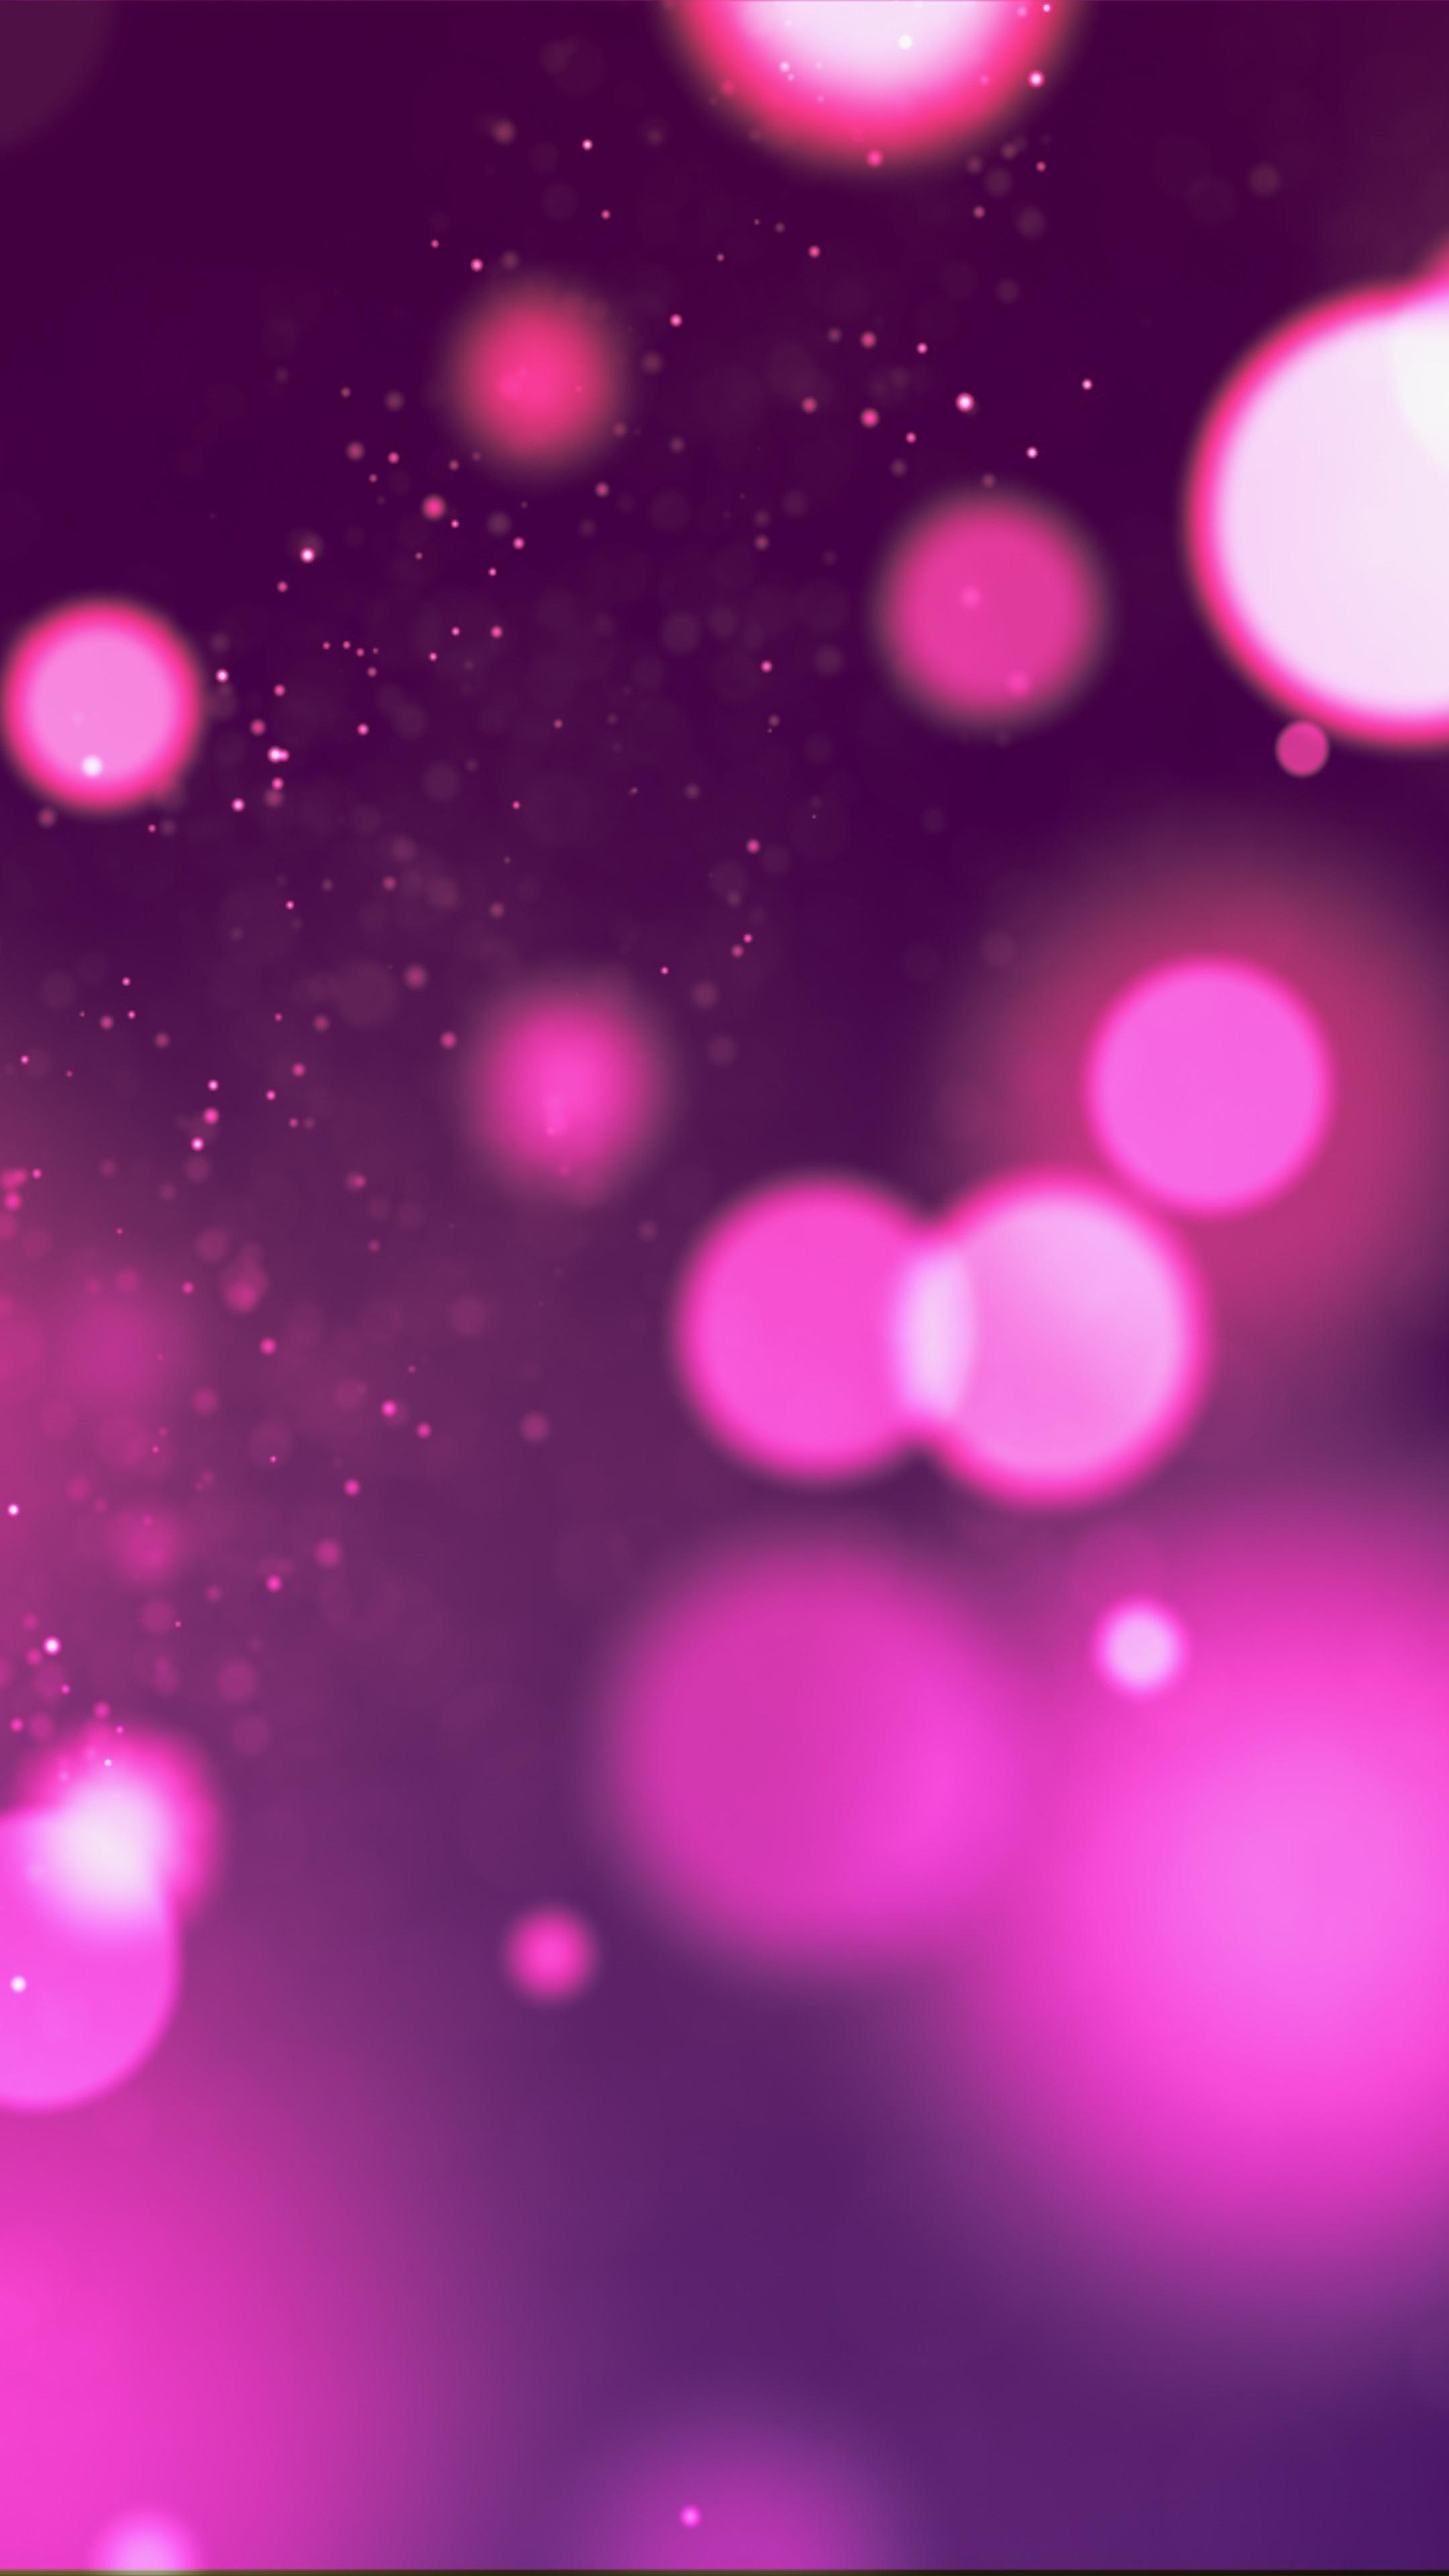 Bokeh Purple Pink Lights Free 4k Ultra Hd Mobile Wallpaper